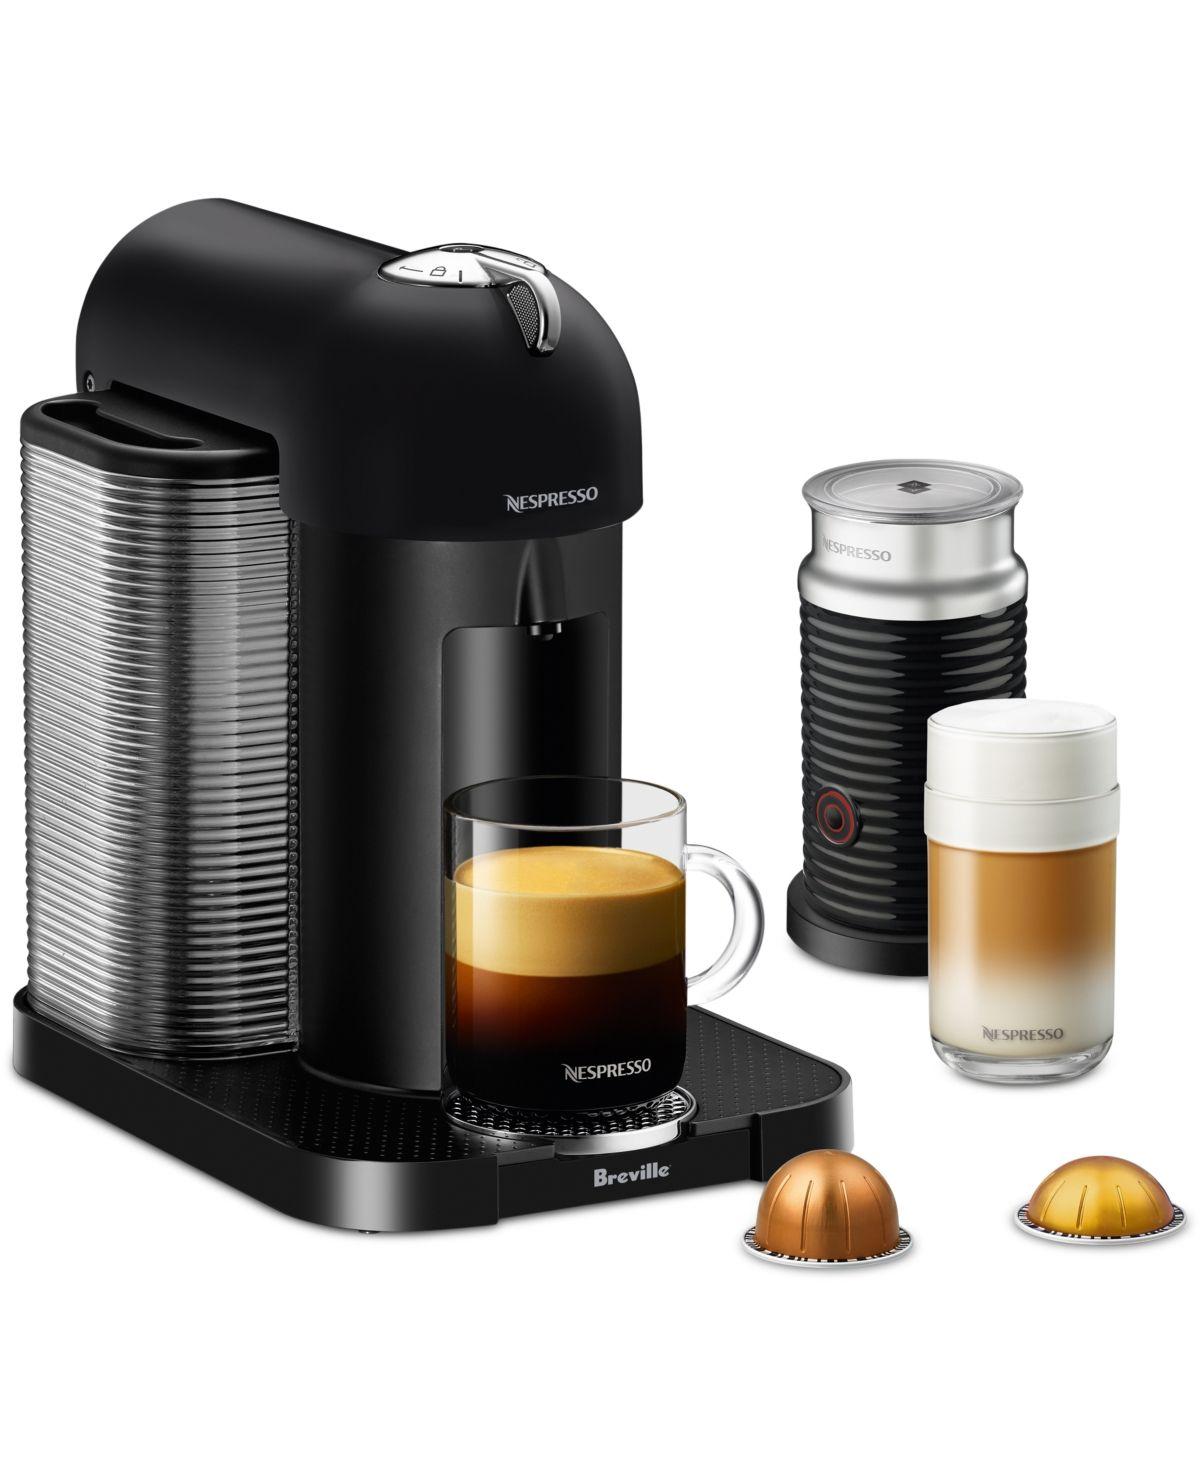 Nespresso by Breville VertuoLine Coffee & Espresso Machine with Aeroccino & Reviews - Coffee Makers - Kitchen - Macy's #espressomaker